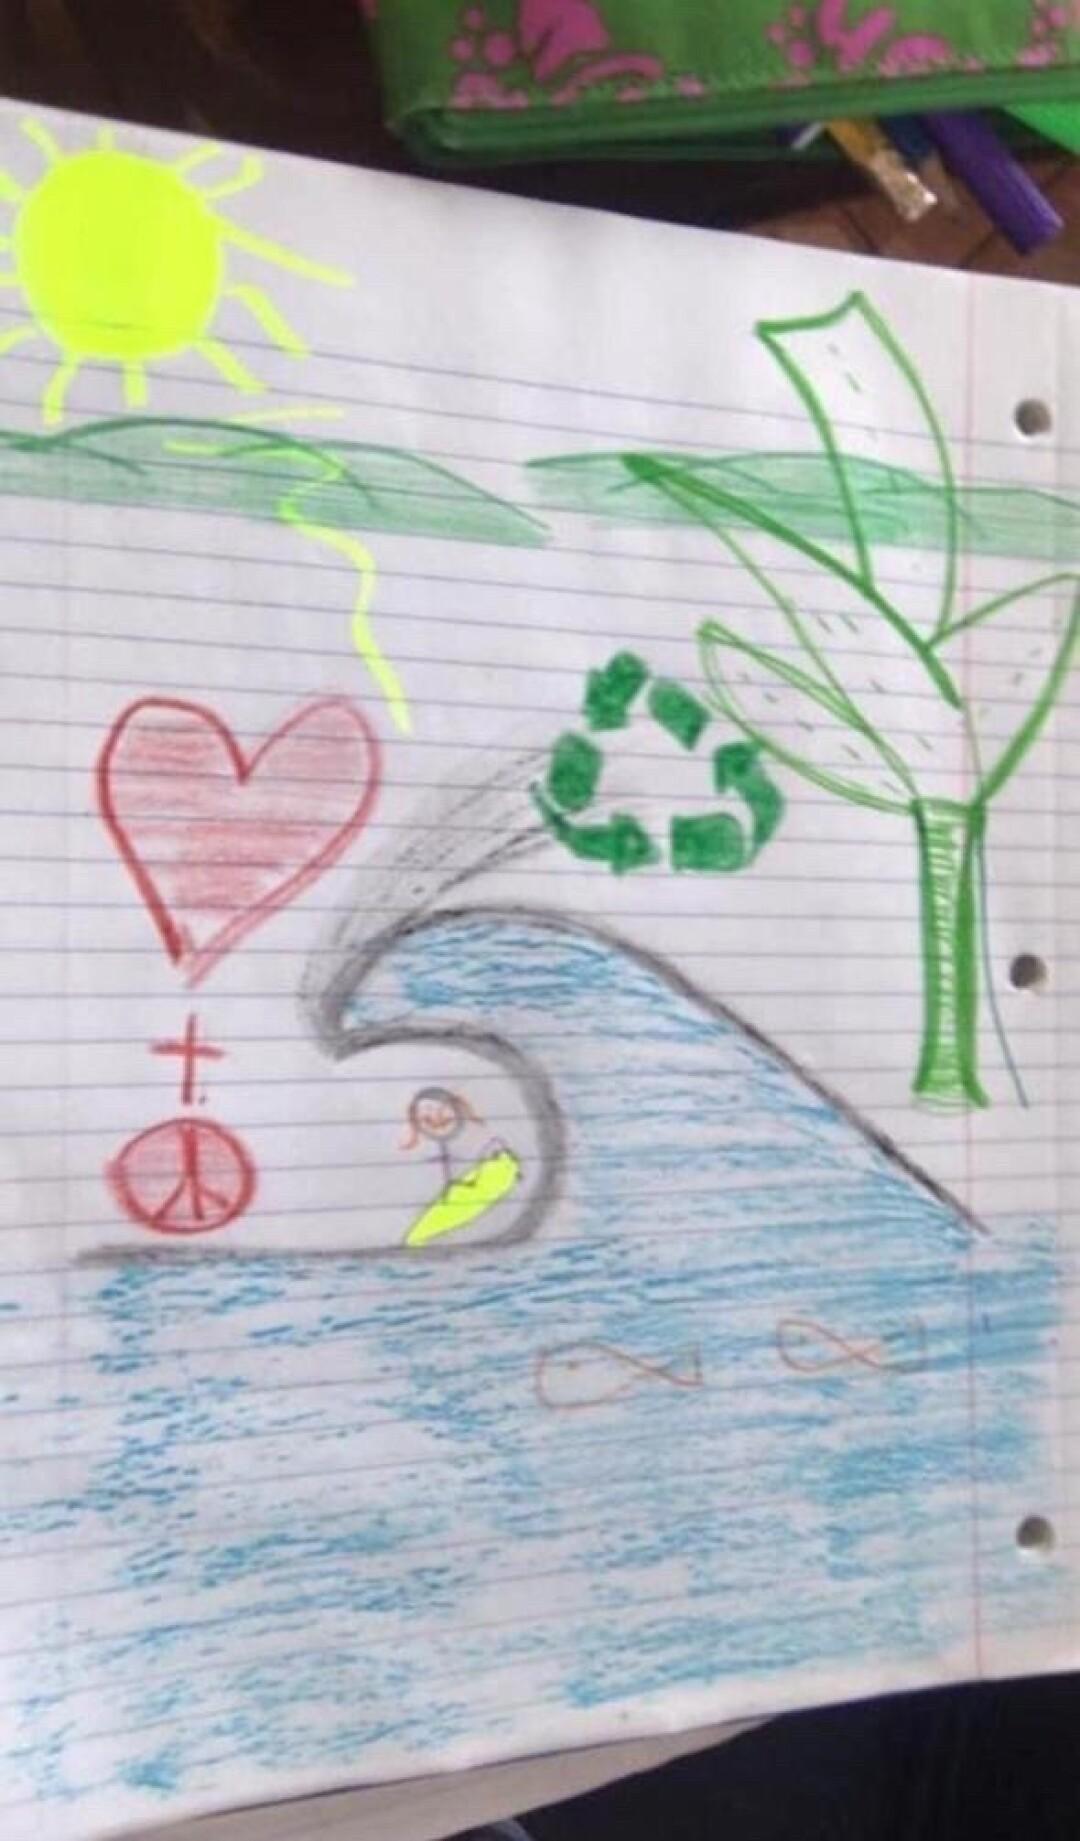 Salvadoran surfer Katherine Díaz drew a picture that depicted her death.